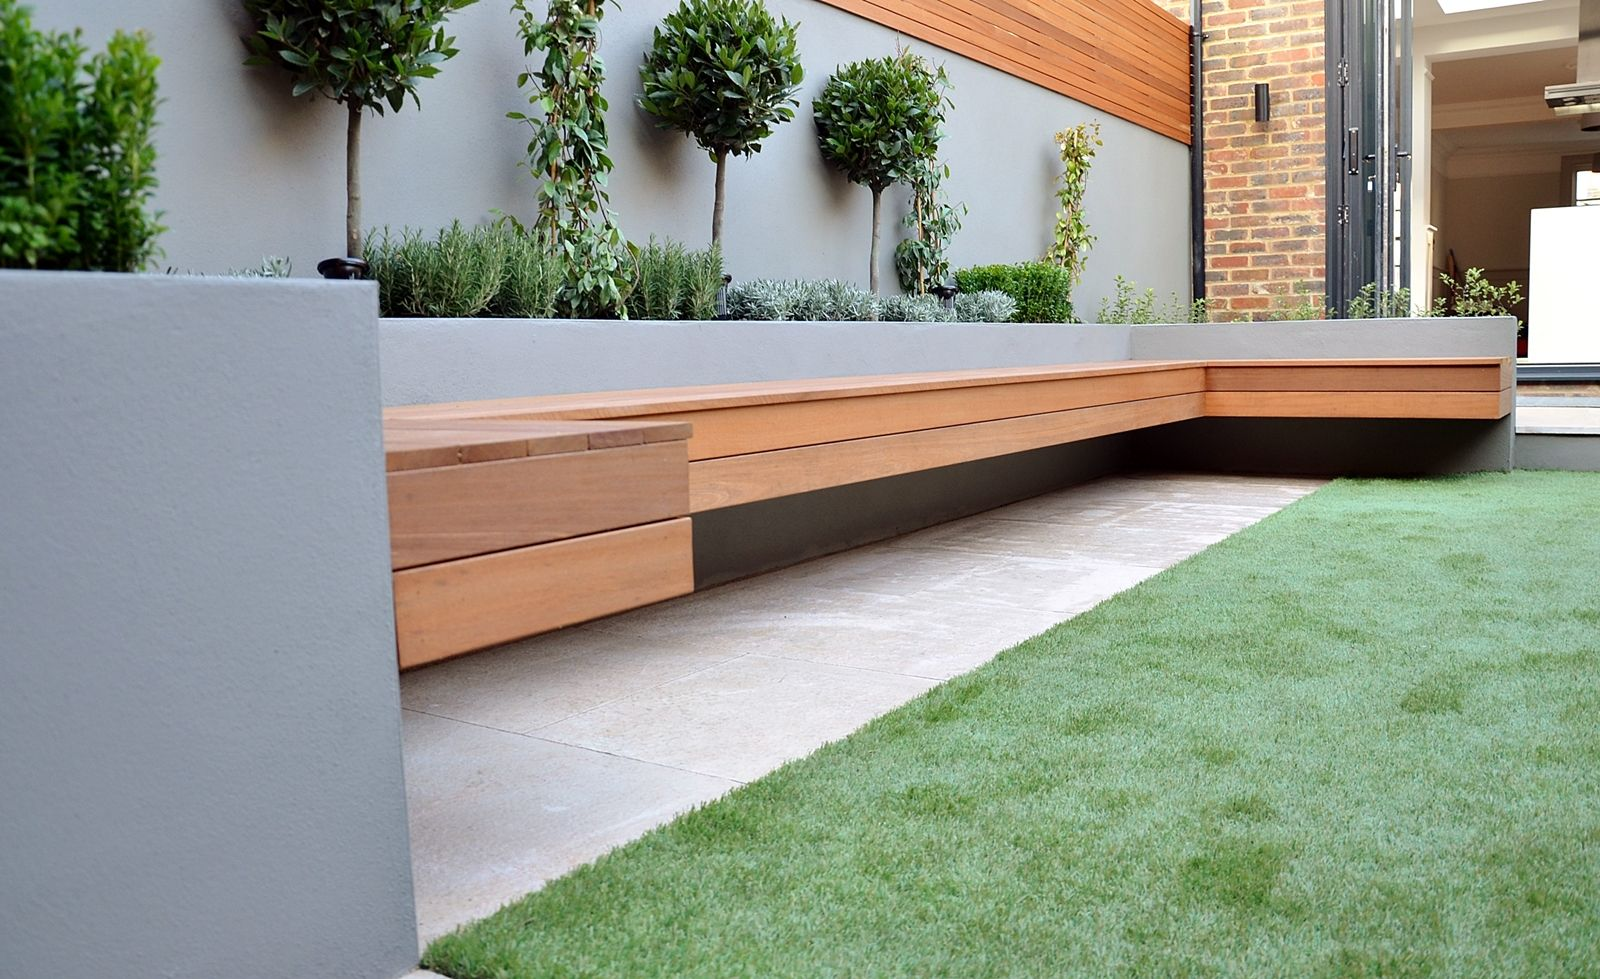 floating bench limestone cream light paving grey raised beds bay